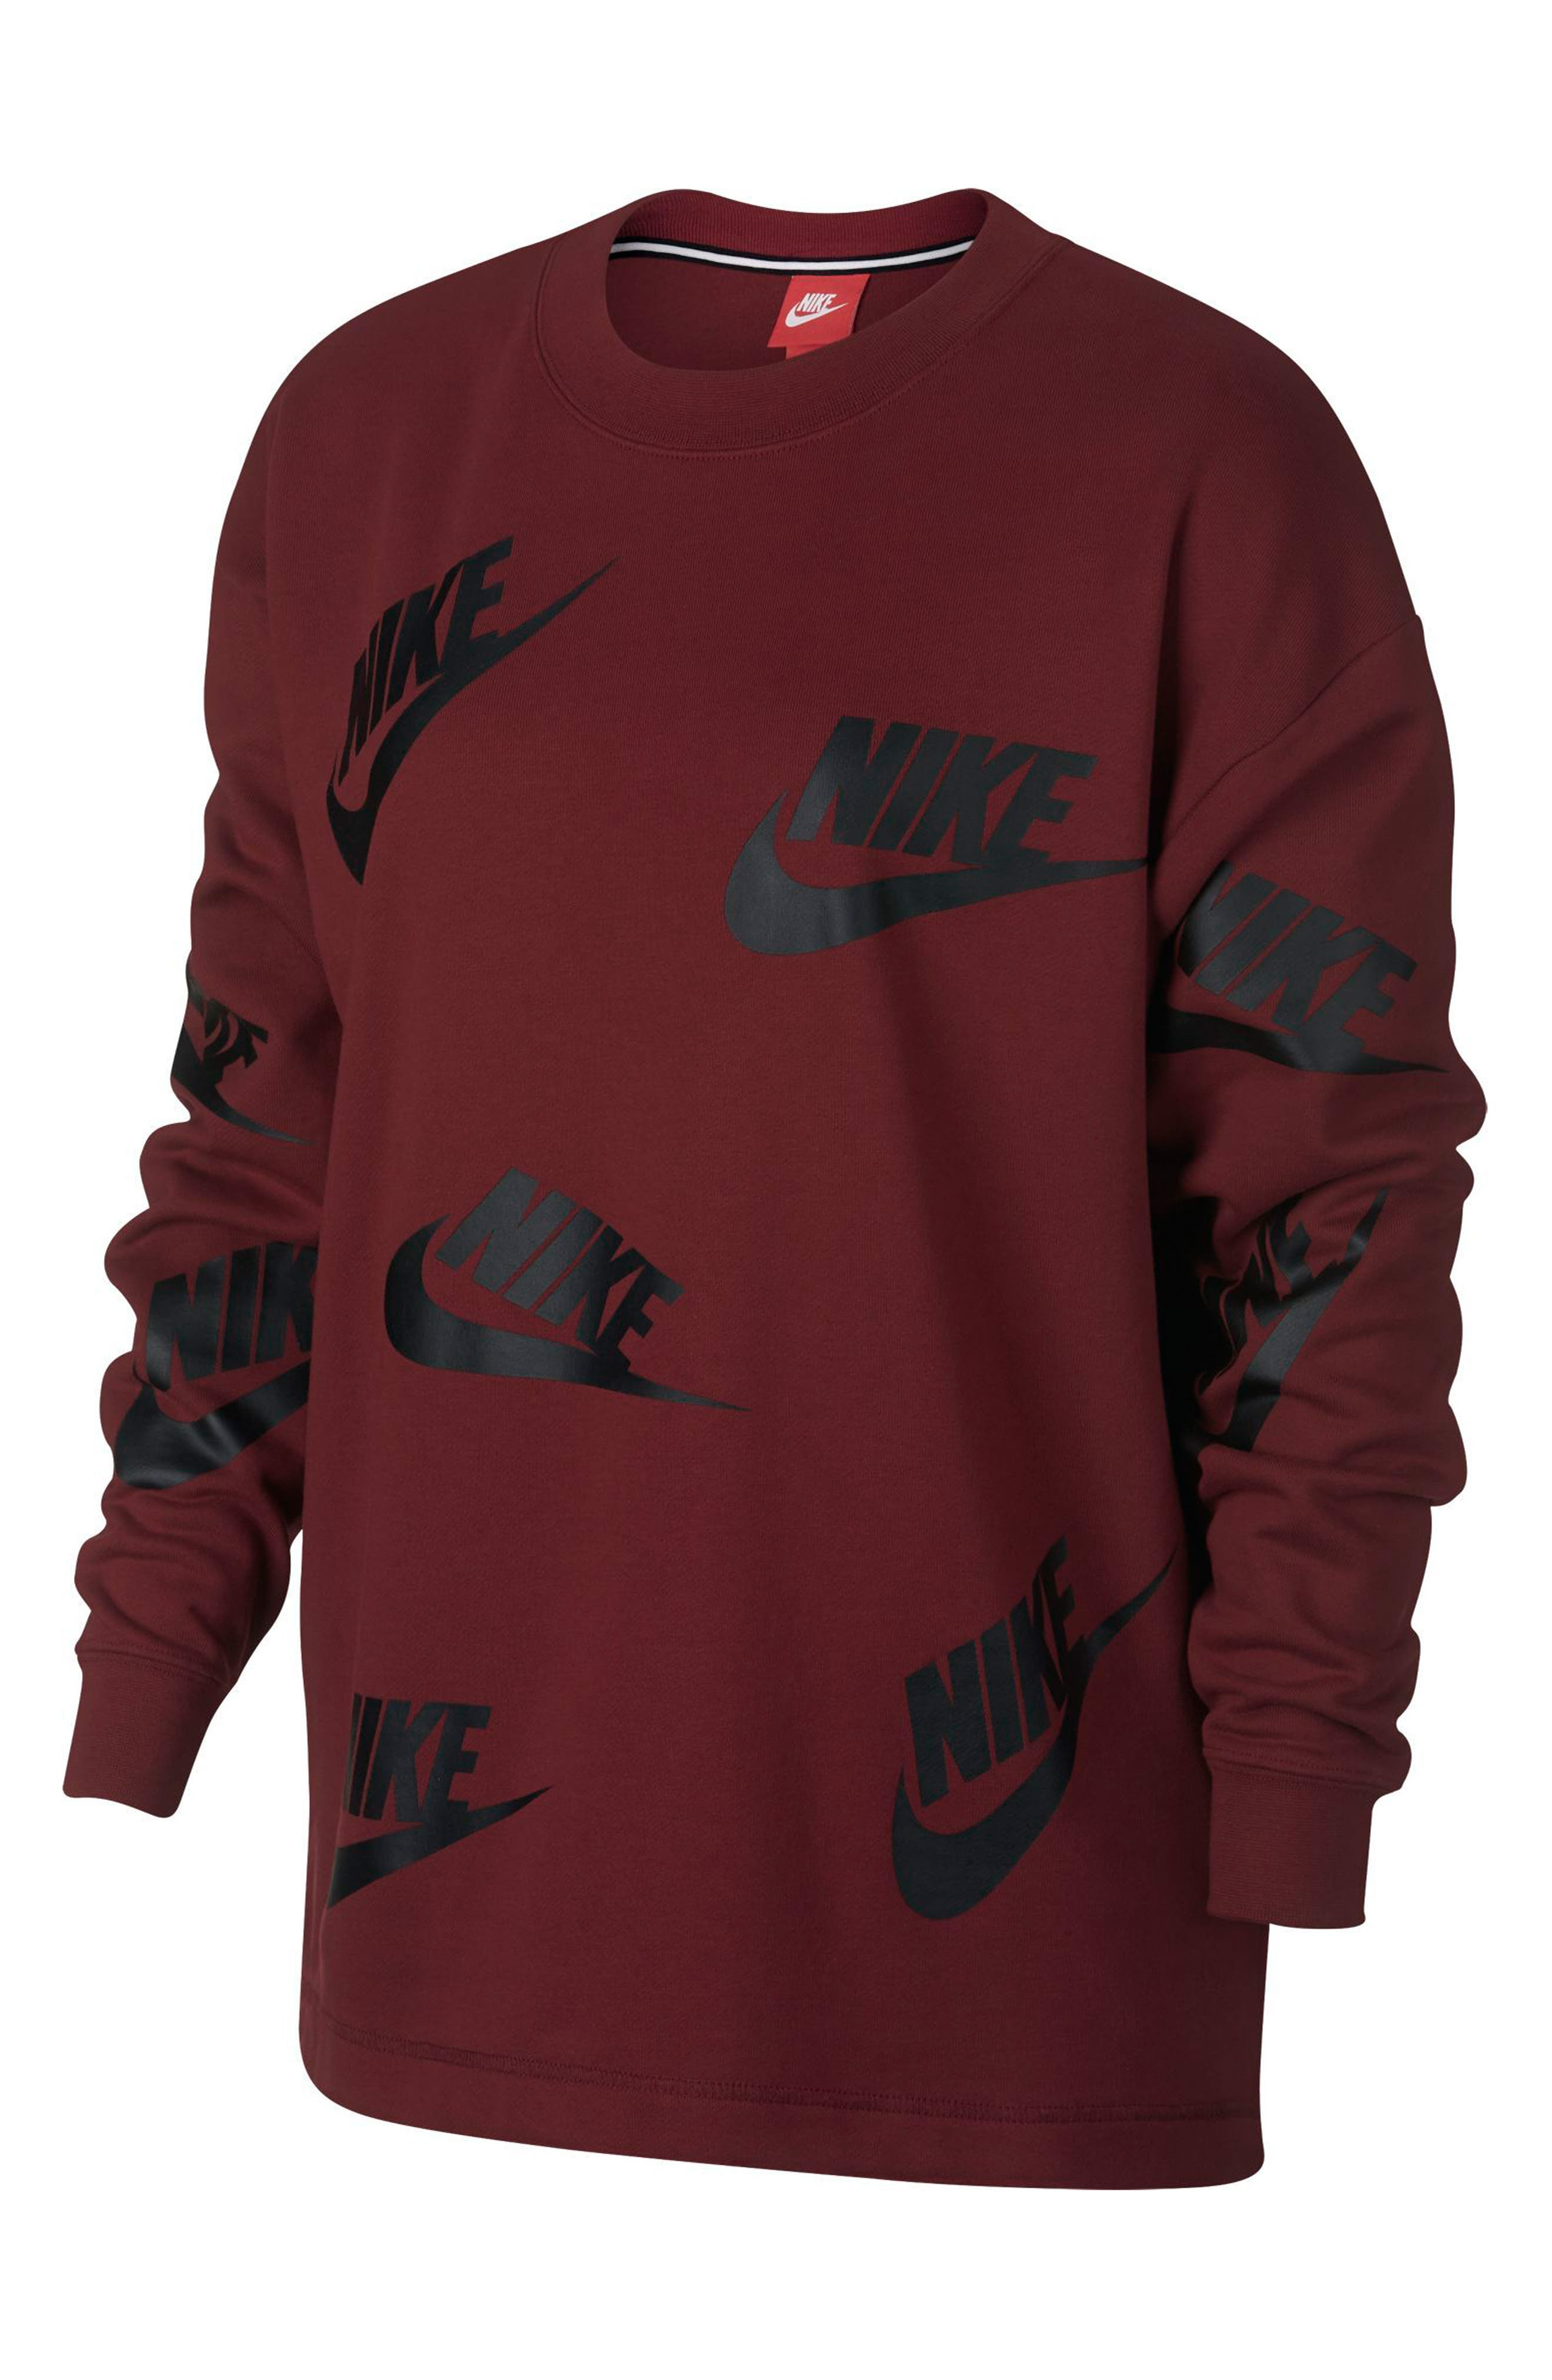 Sportswear Futura Women's Crewneck Sweatshirt,                             Main thumbnail 1, color,                             Team Red/ Black